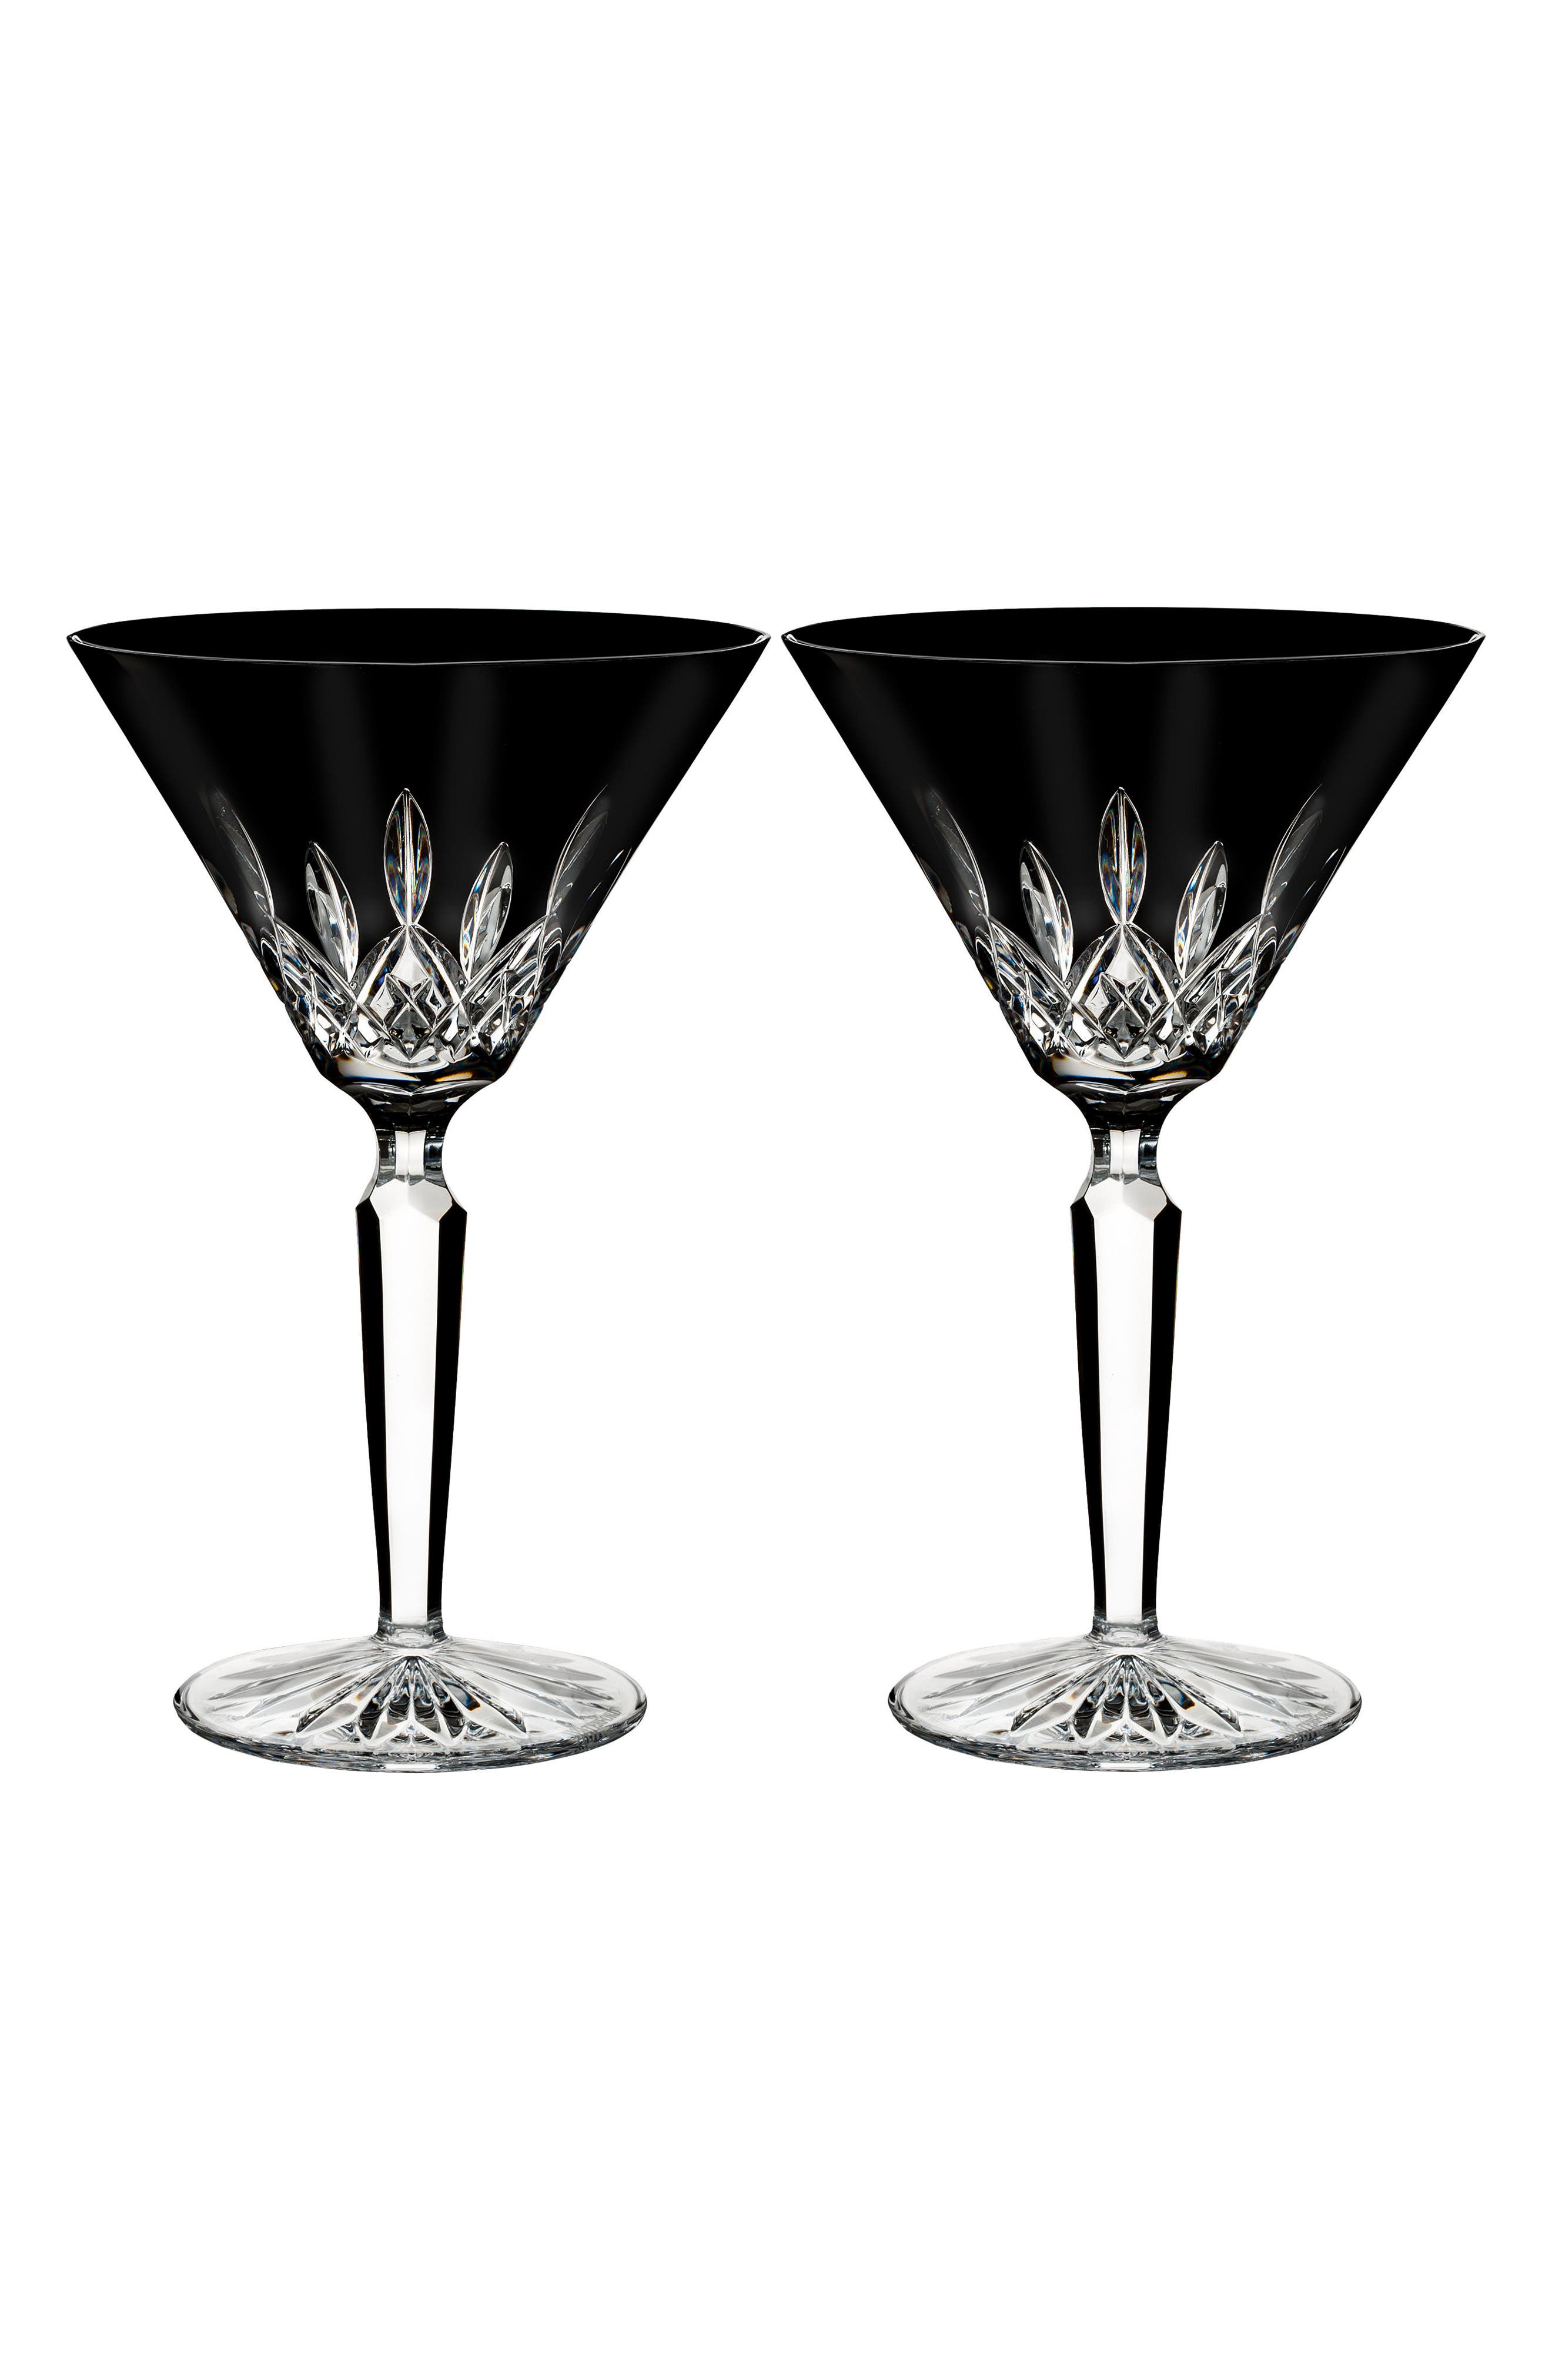 Main Image - Waterford Lismore Diamond Set of 2 Black Lead Crystal Martini Glasses